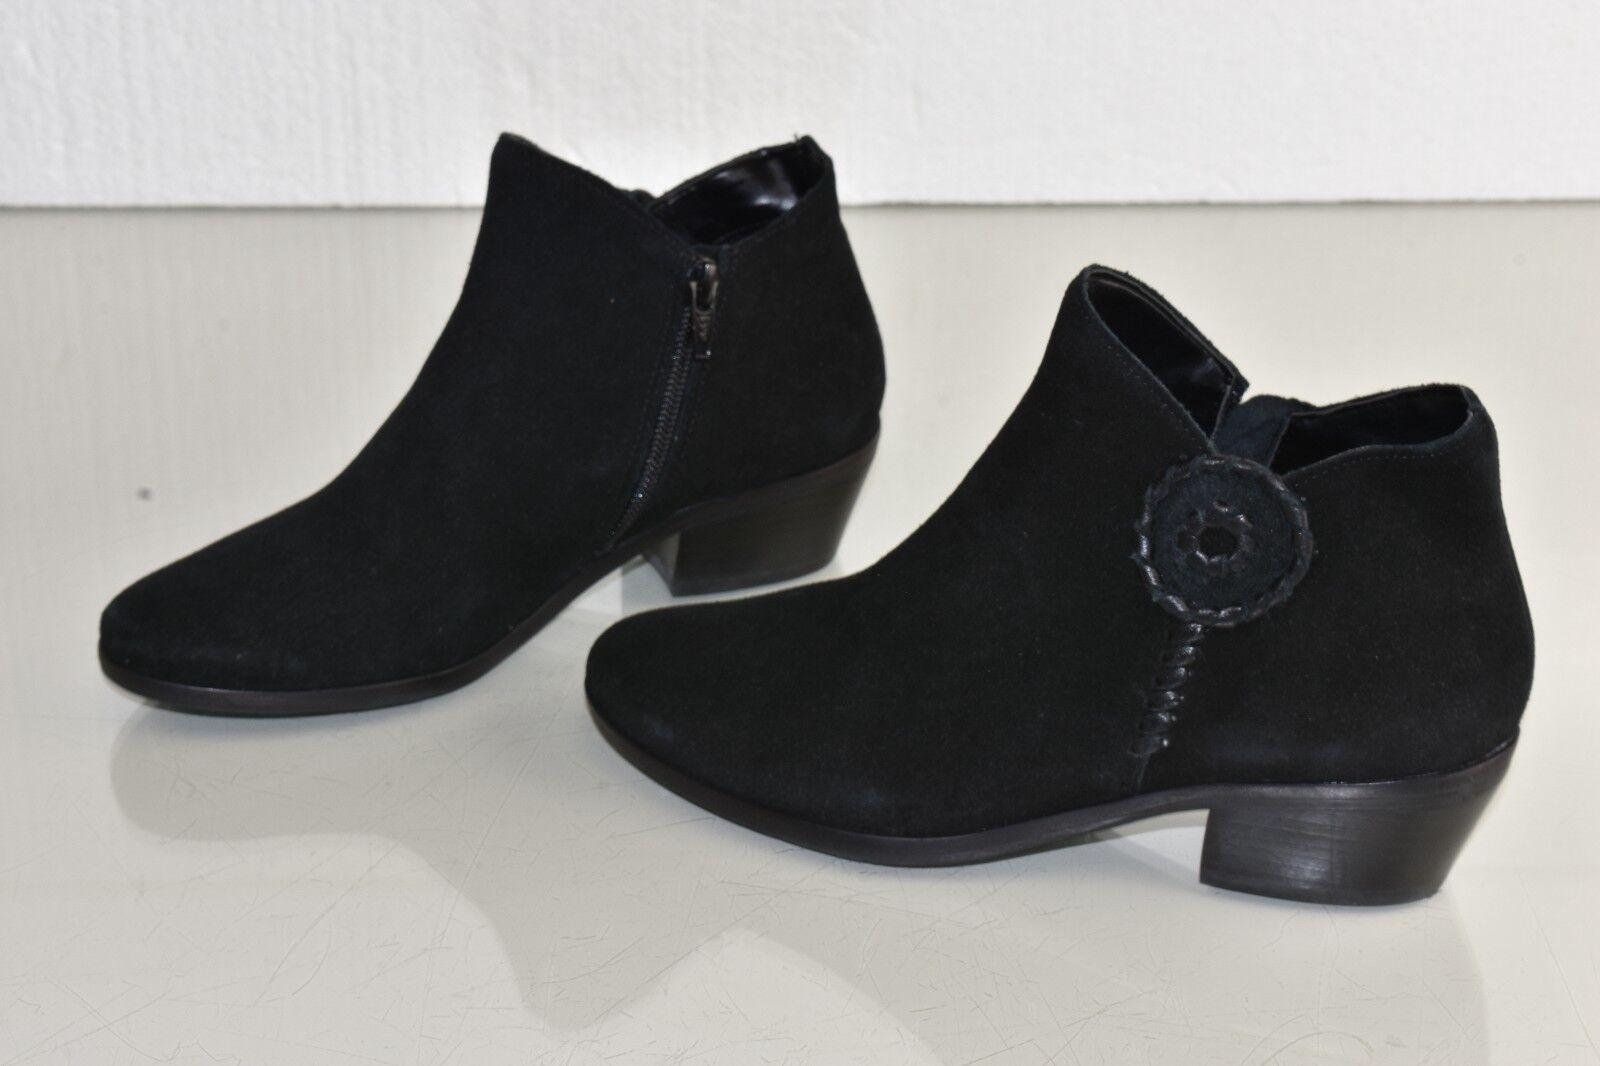 Bella Vita Women's Kiki Boot, Stone Leather, US 8.5 W US Leather, c24906